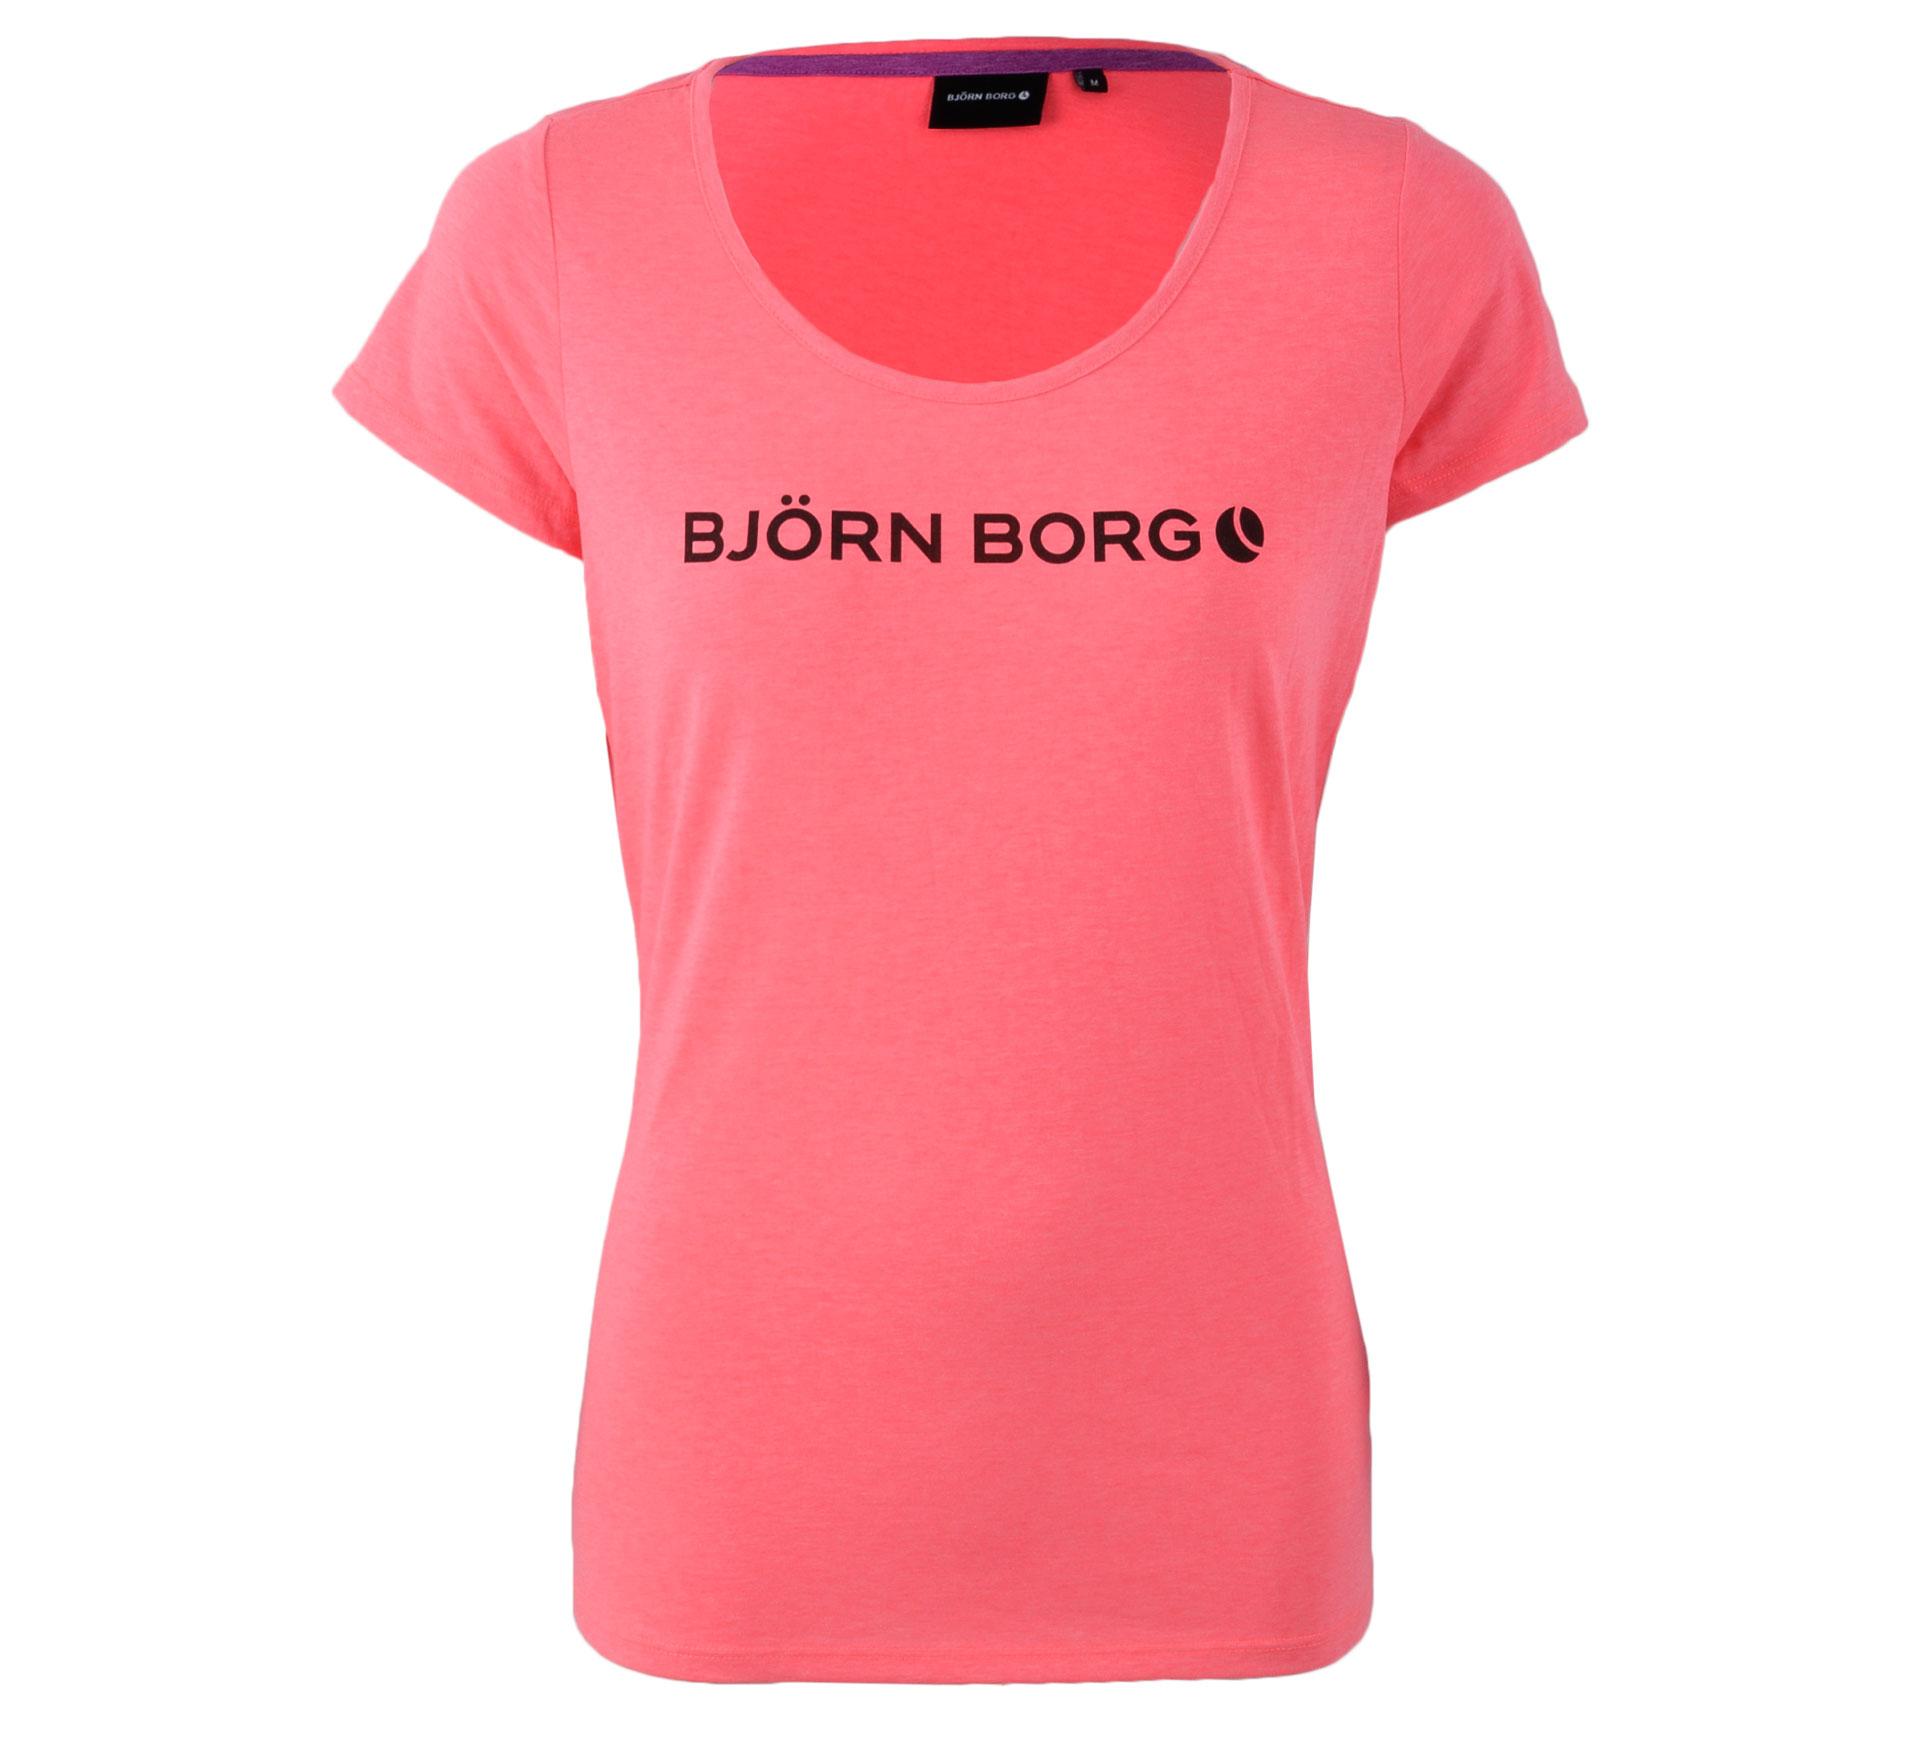 Bjorn Borg Björn Borg Sabea T-shirt Dames roze